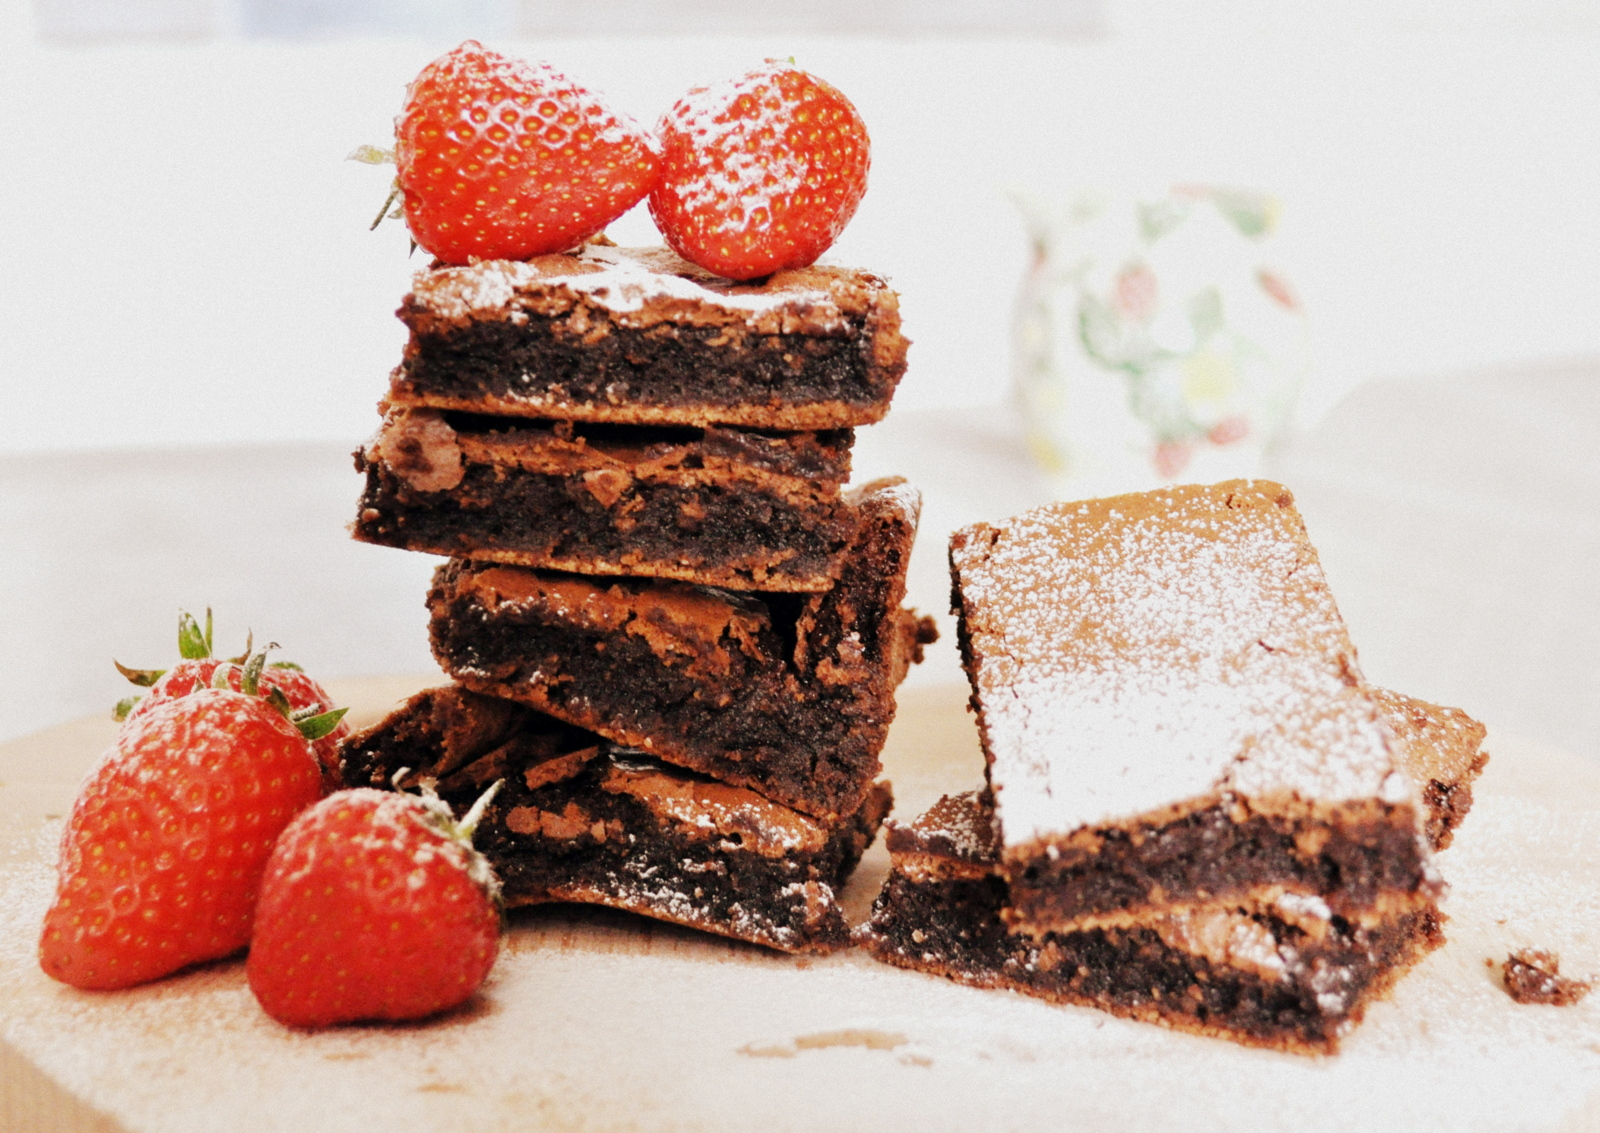 Astonishing Brownies Most Indulgent Chocolate Brownies Ever S Patisserie How Long Do Brownies Last Refrigerator How Long Do Brownies Last Stoned nice food How Long Do Brownies Last